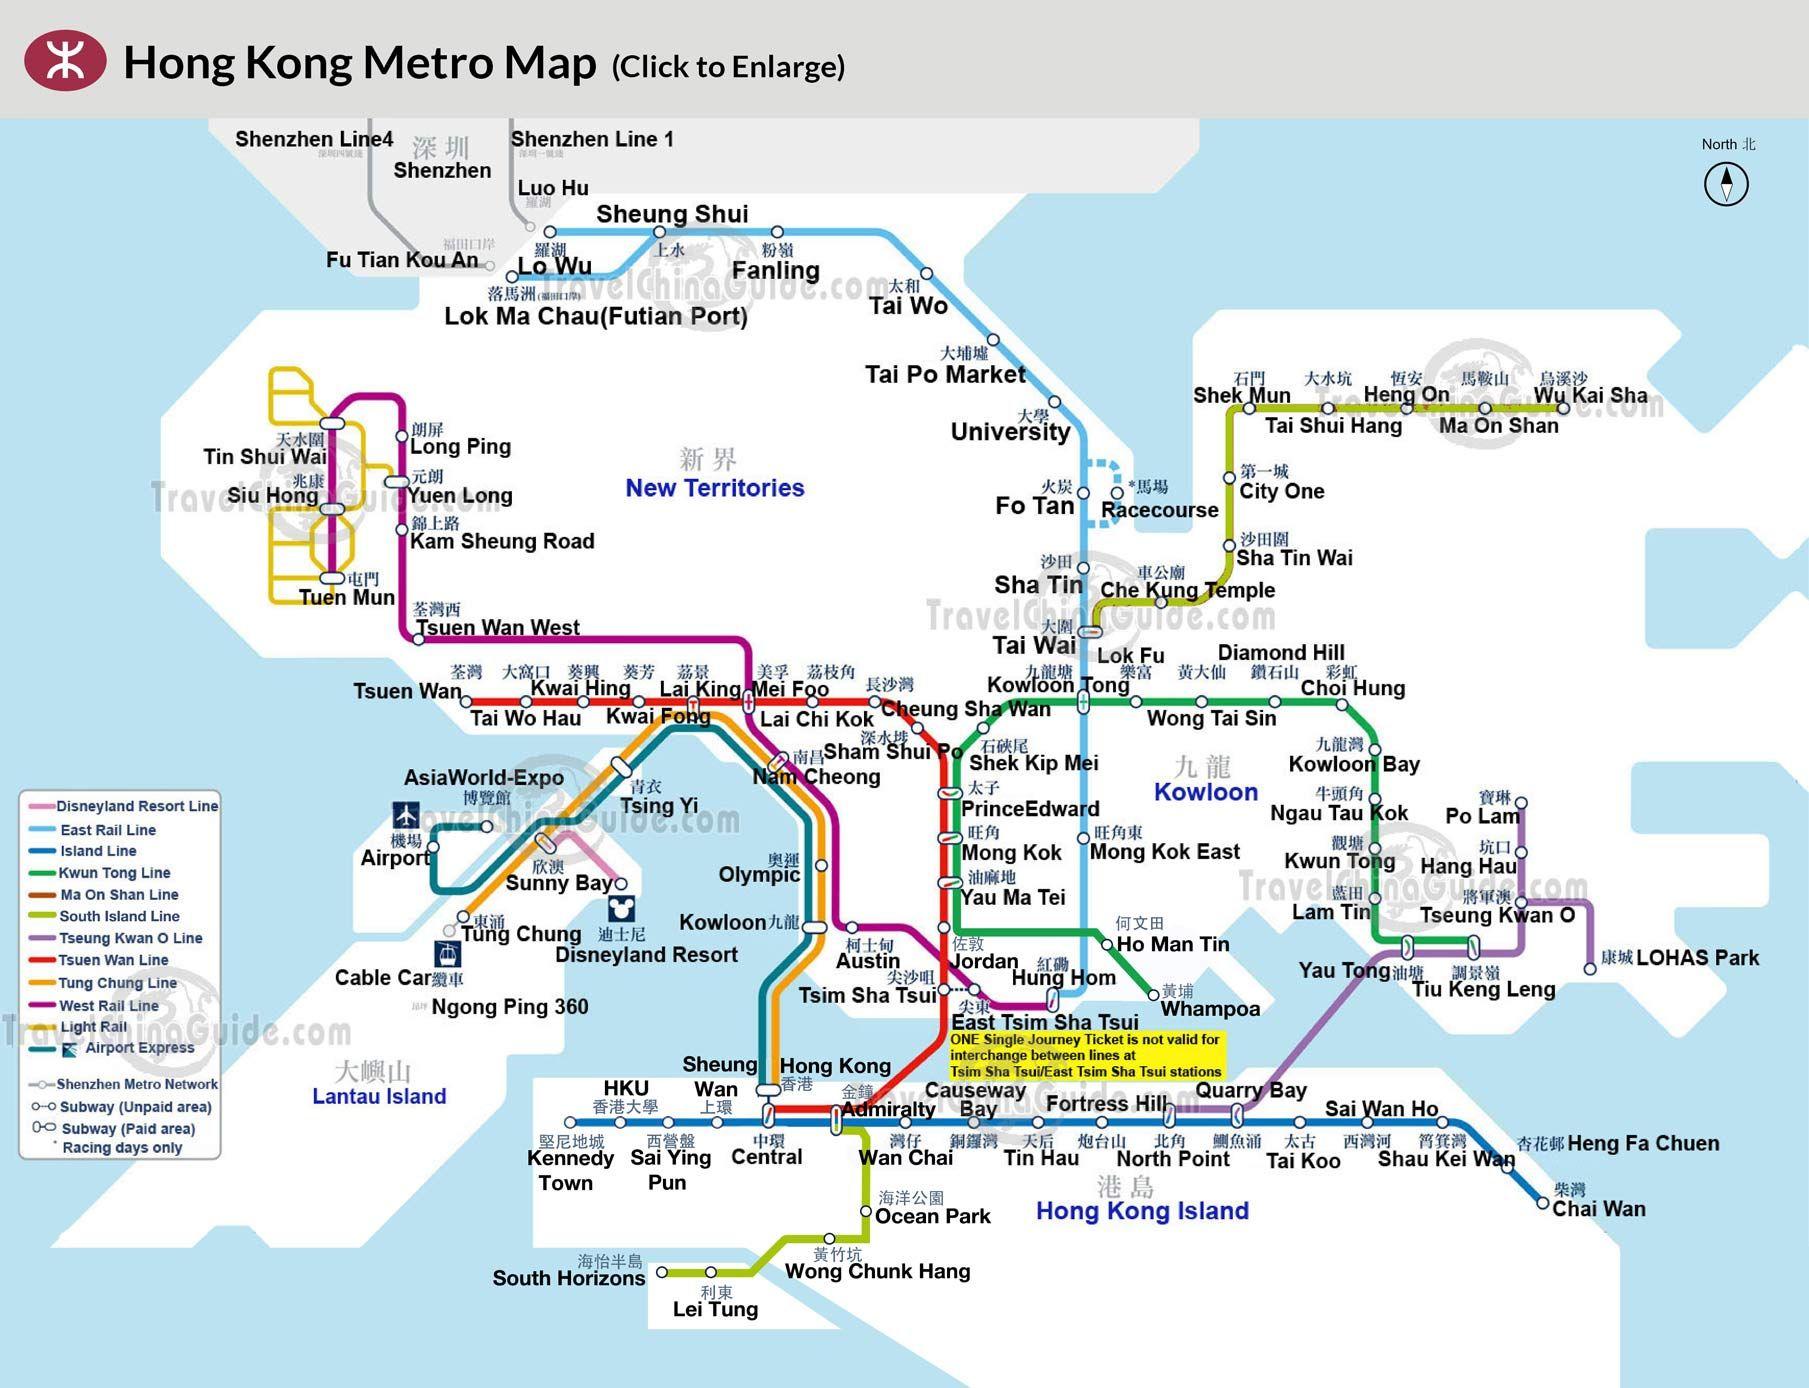 Subway Map Of Hong Kong.What To Do In Hong Kong What S Not Worth It Vlog Guide Hong